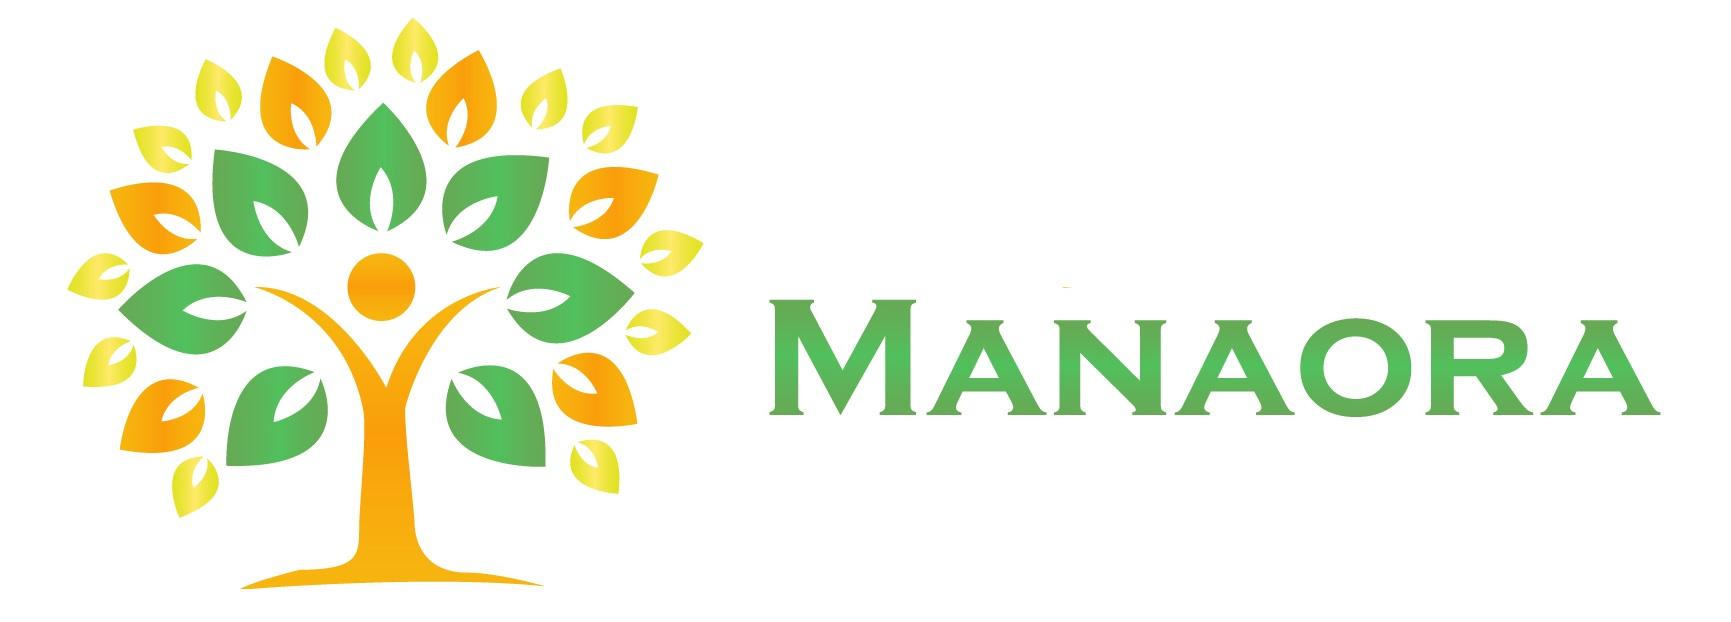 Manaora